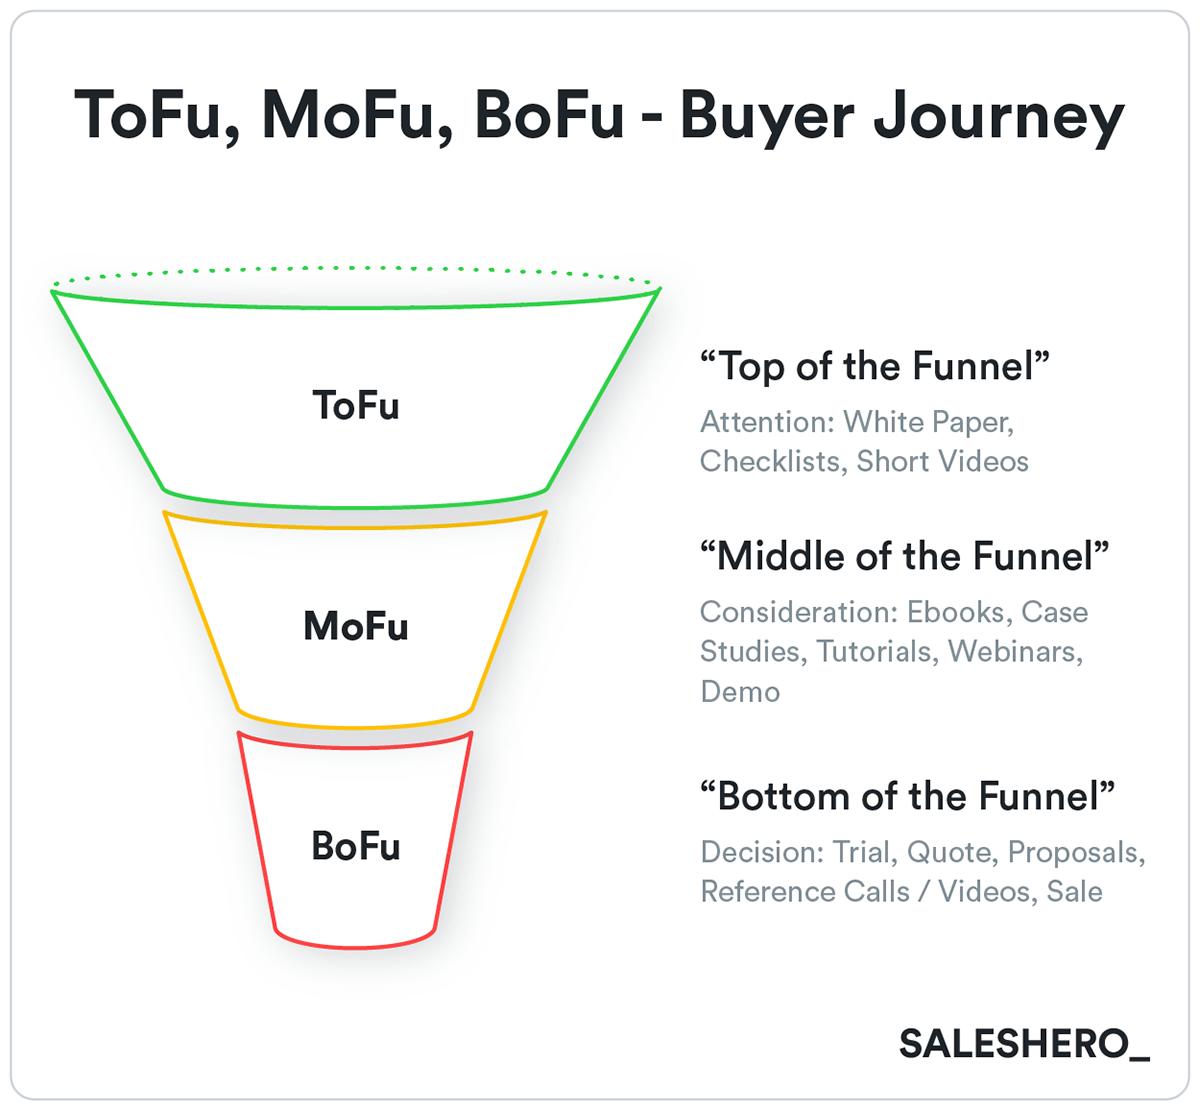 buyer's journey in a go to market framework